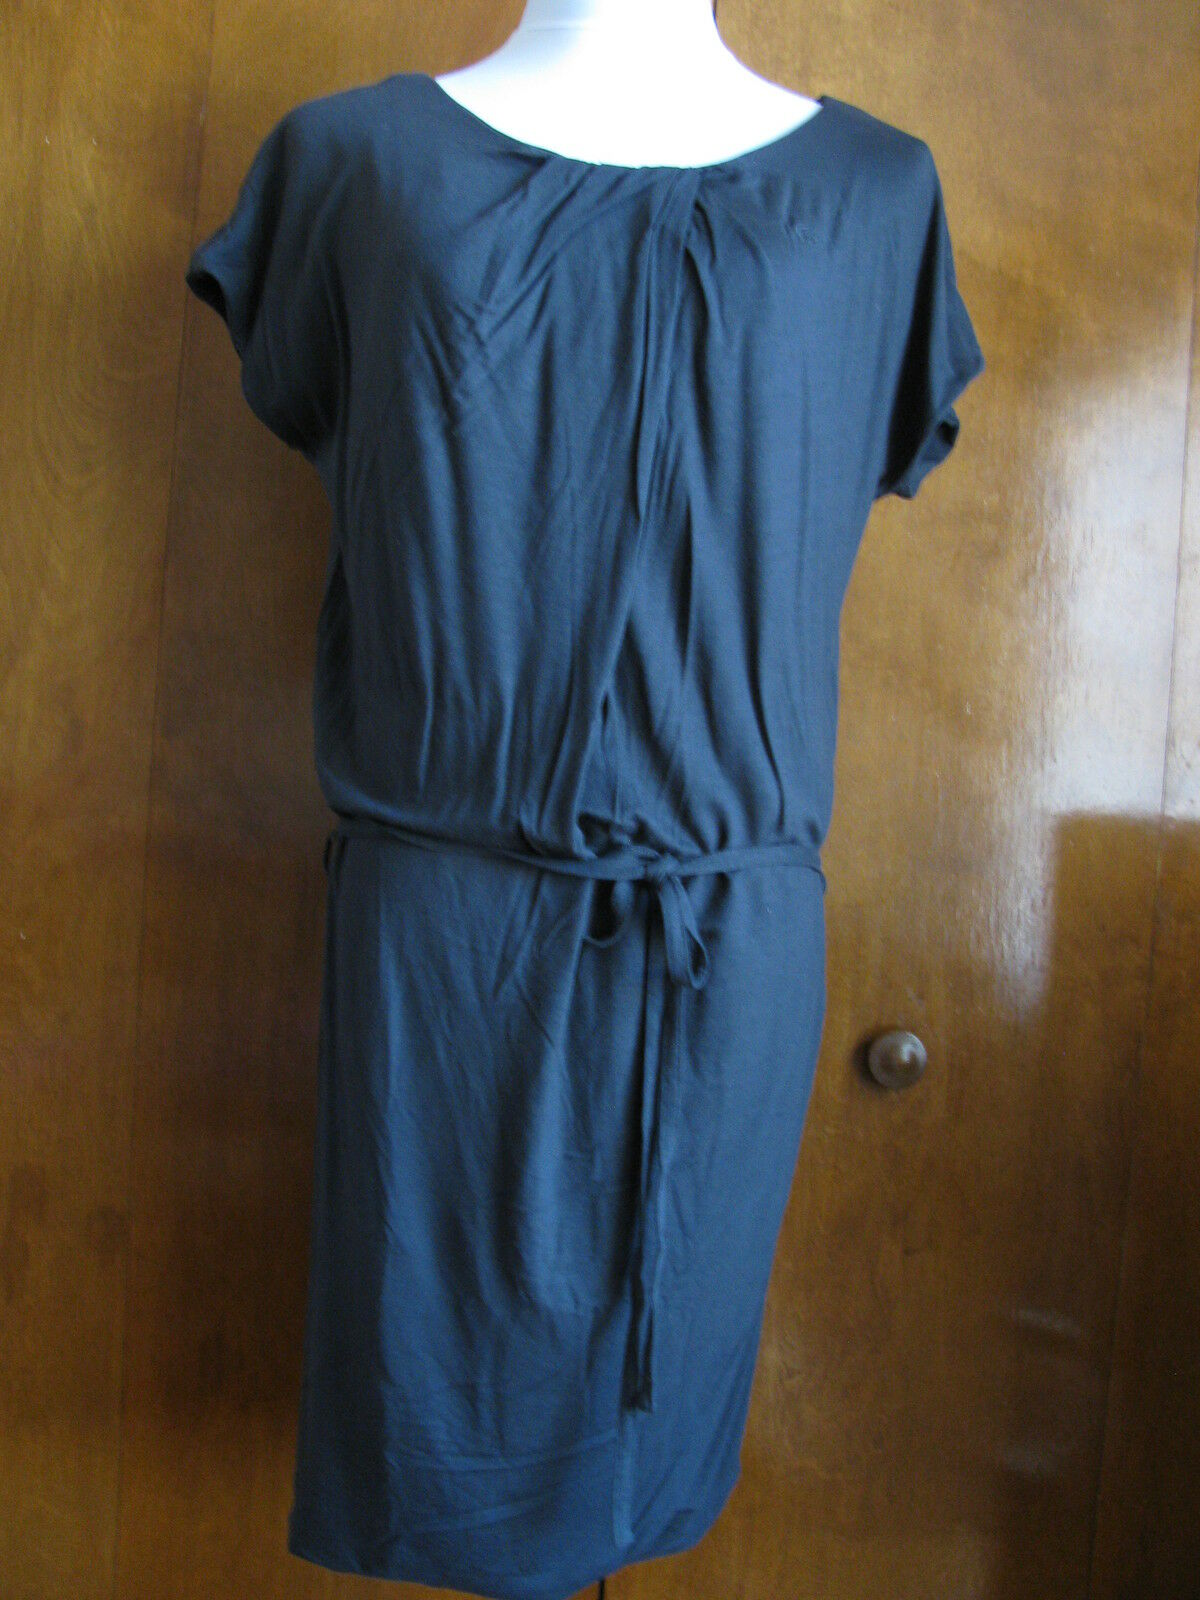 Lacoste Woherren schwarz Lined Dress Größe 4 Europe 36 NWT